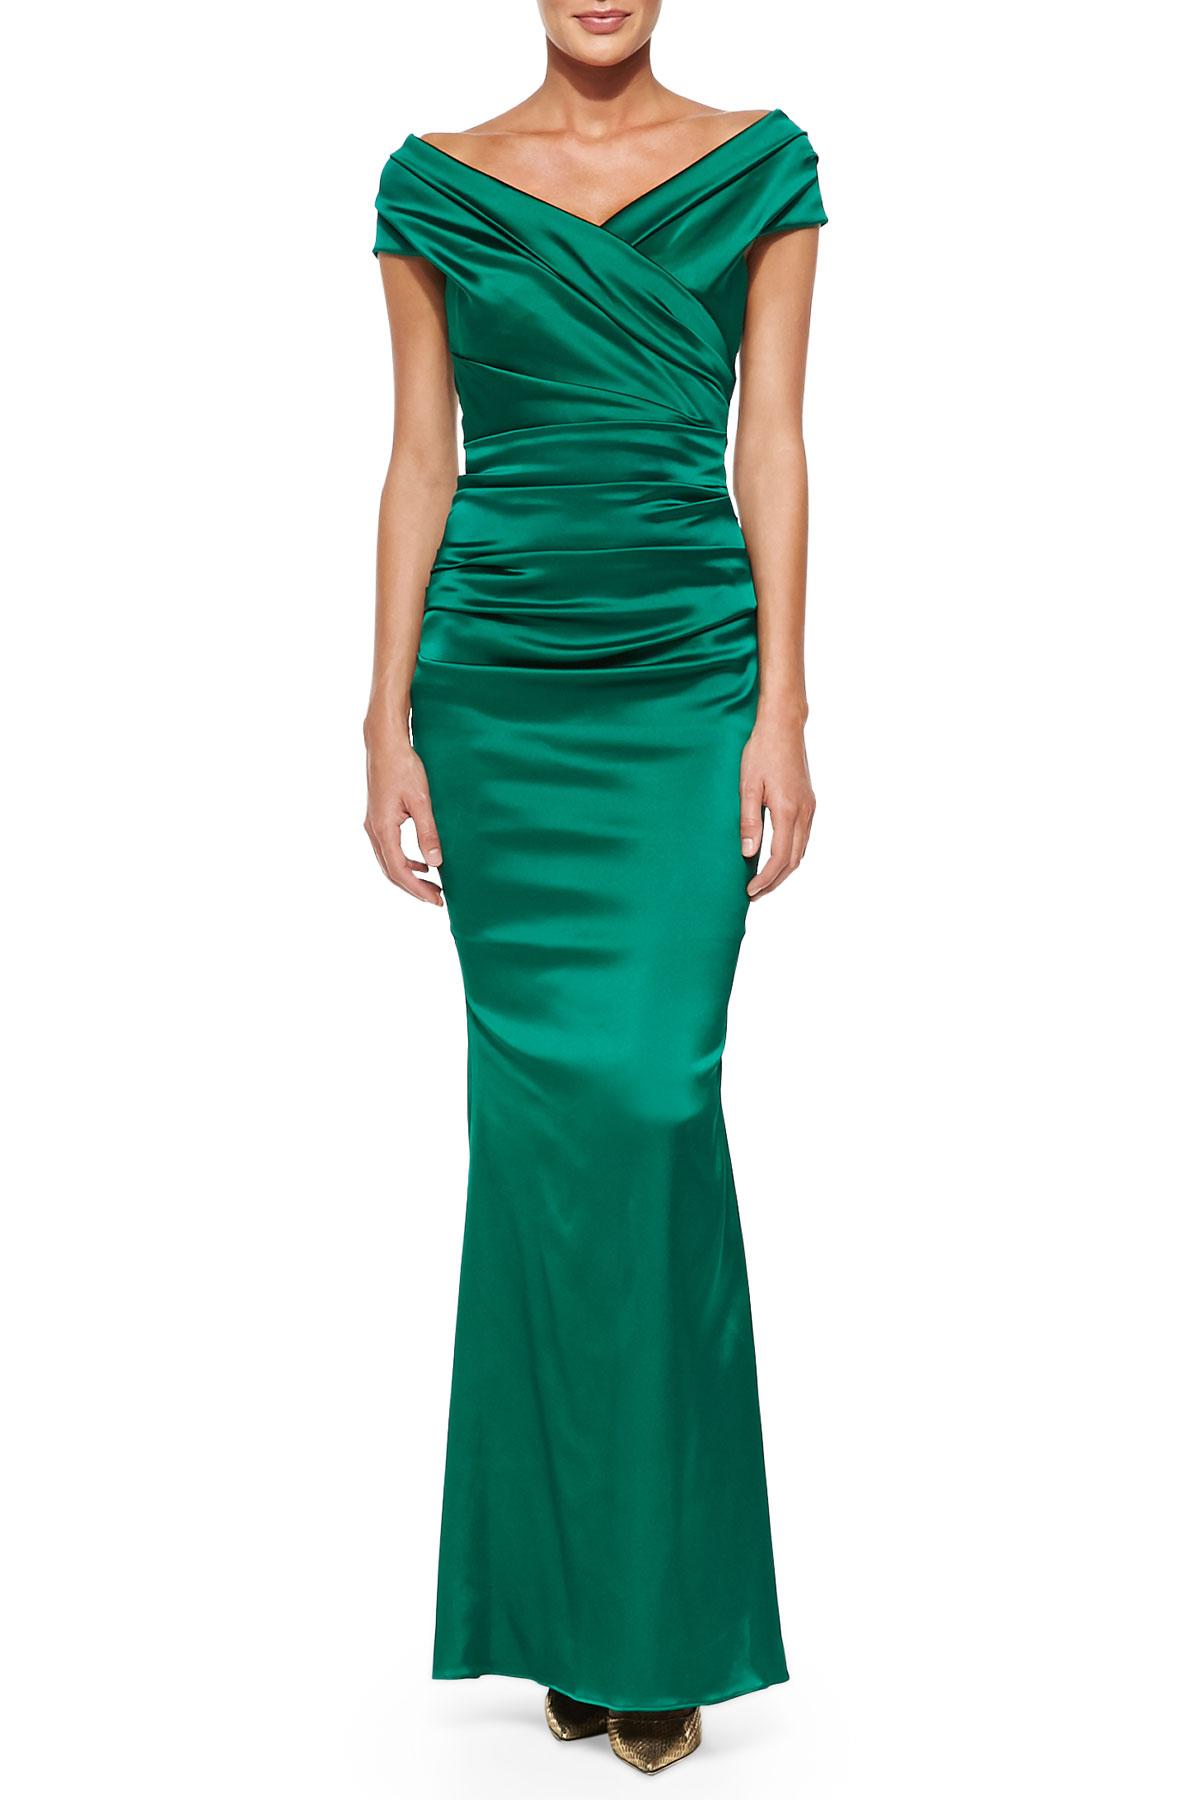 Lyst Talbot Runhof Off Shoulder Ruched Mermaid Gown In Green